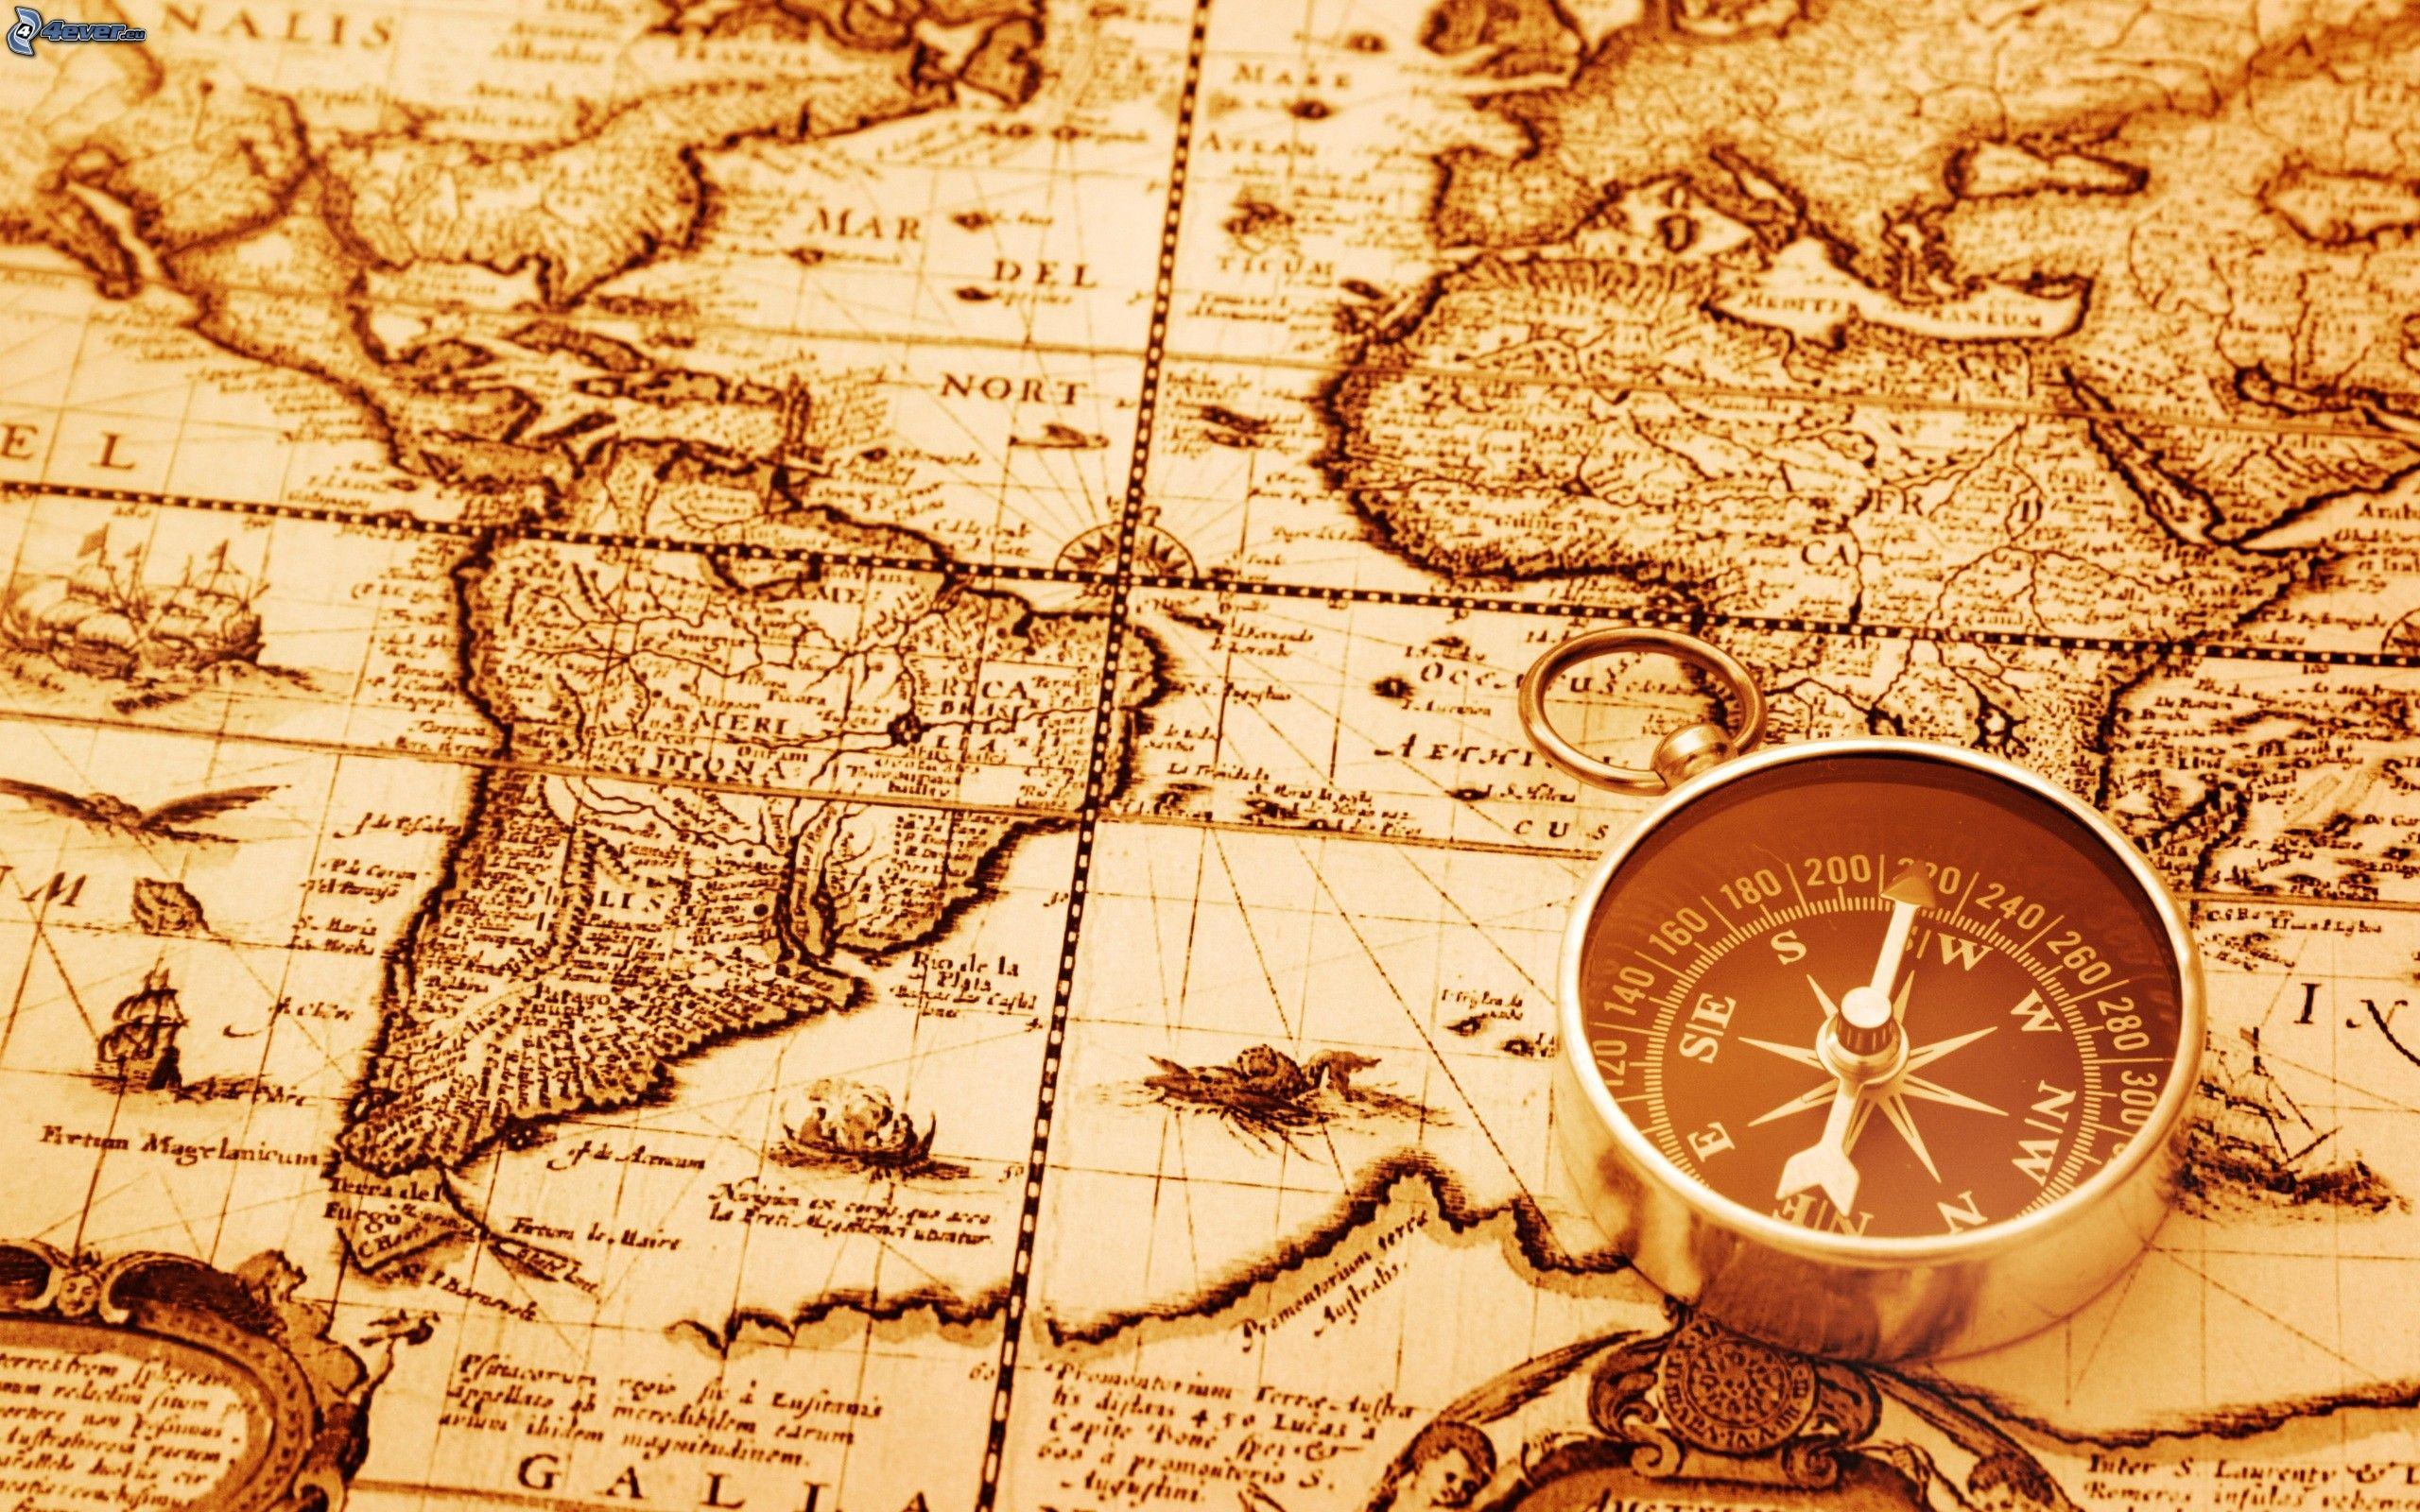 mapa-del-mundo-brujula-174155